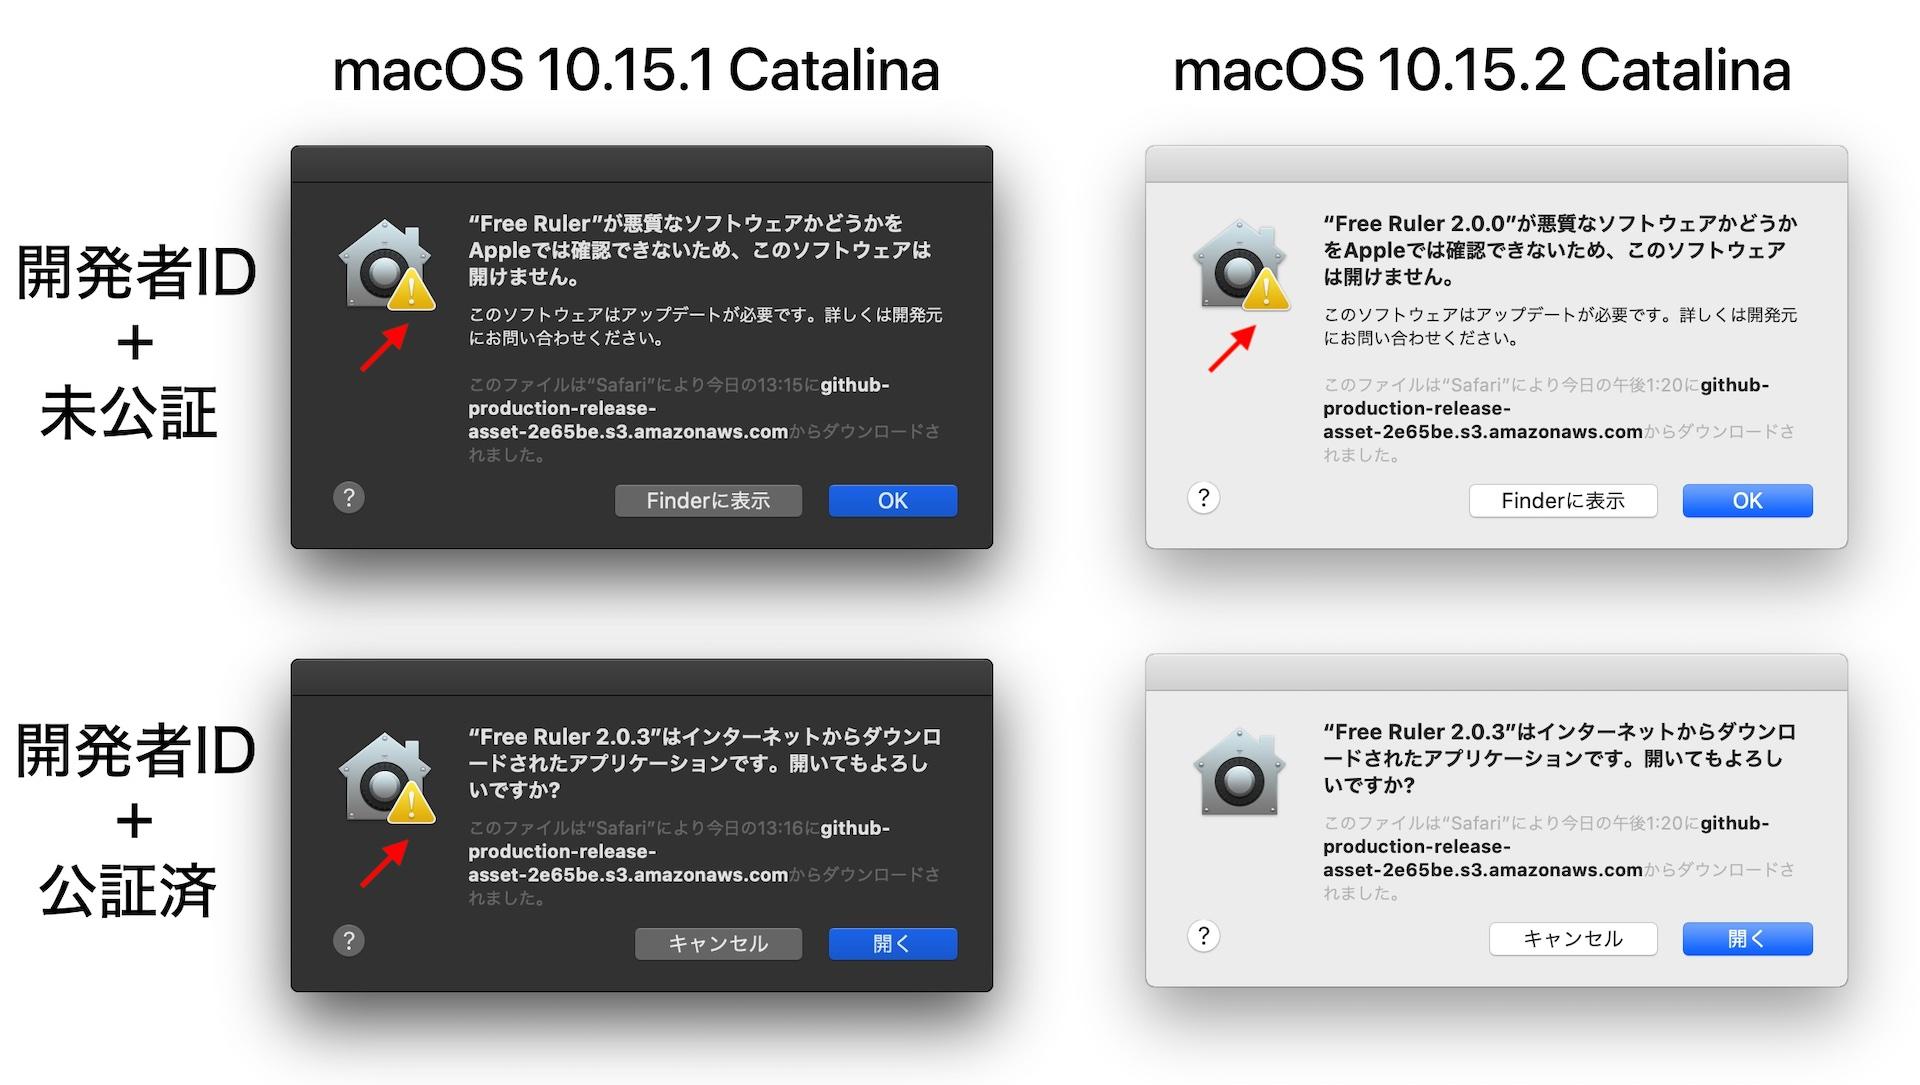 macOS 10.15.2 CatalinaのGatekeeper警告